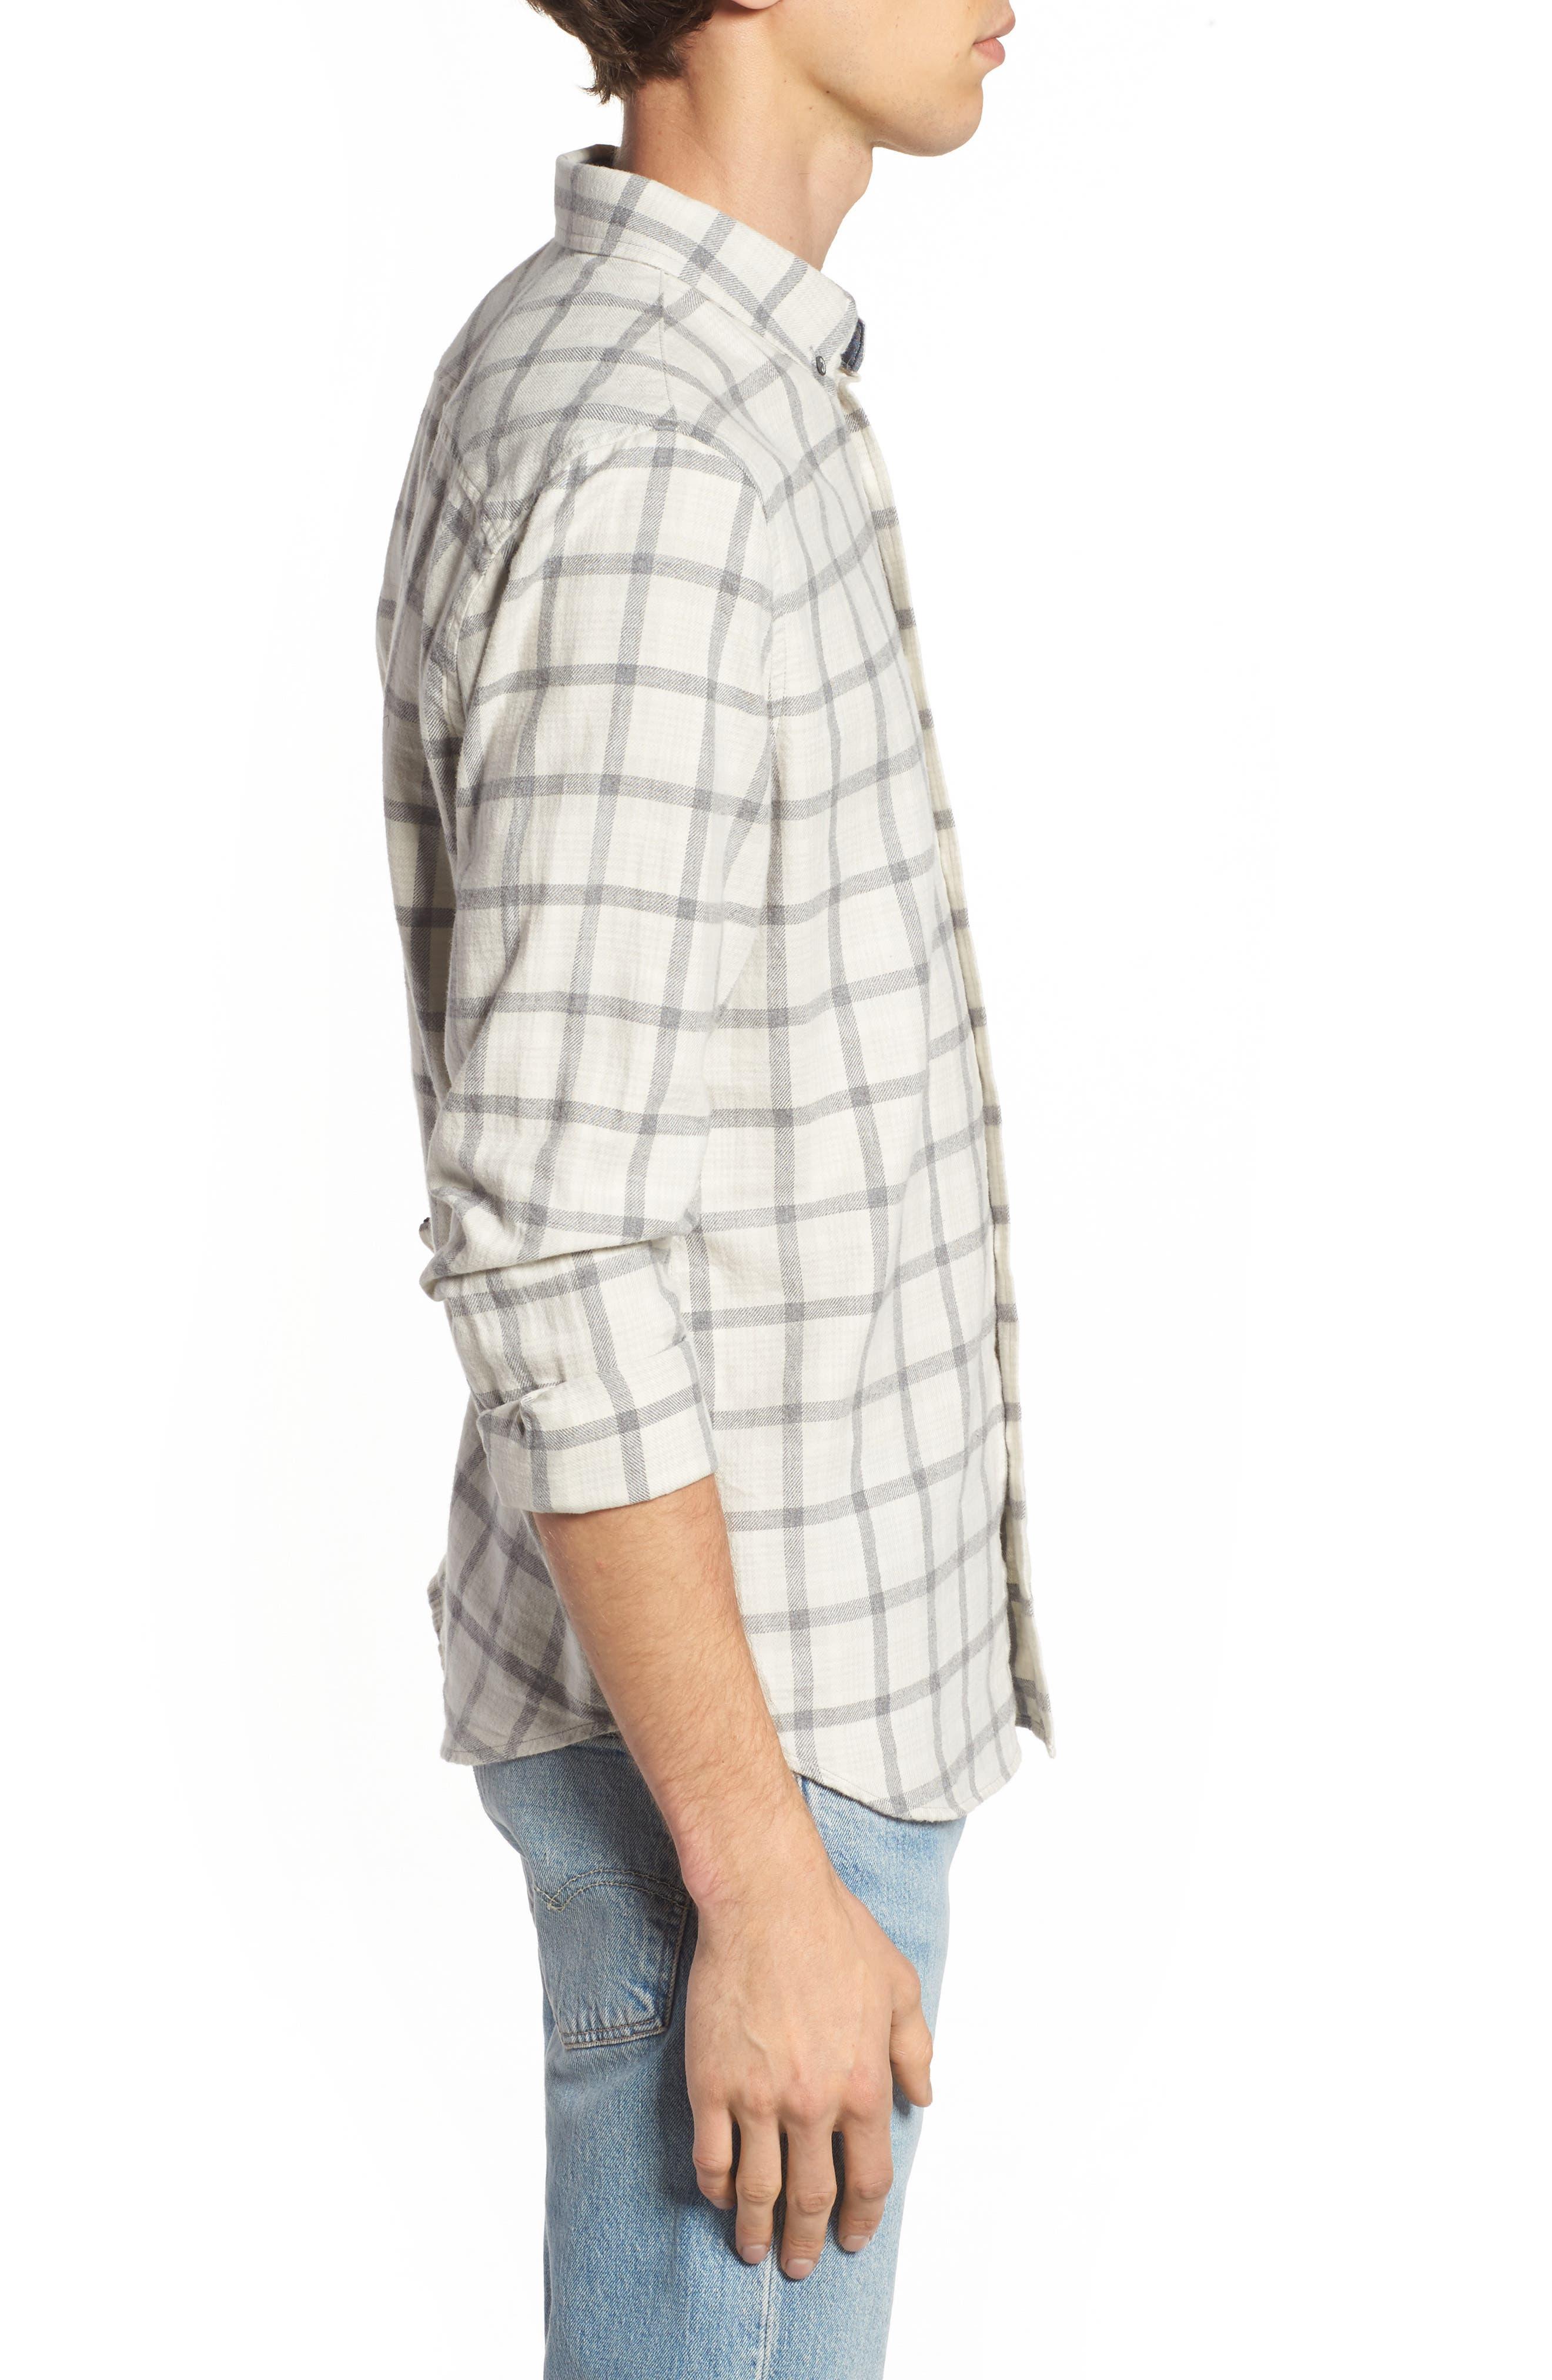 Grady Slim Fit Plaid Sport Shirt,                             Alternate thumbnail 3, color,                             Moon Glade/ Heather Grey